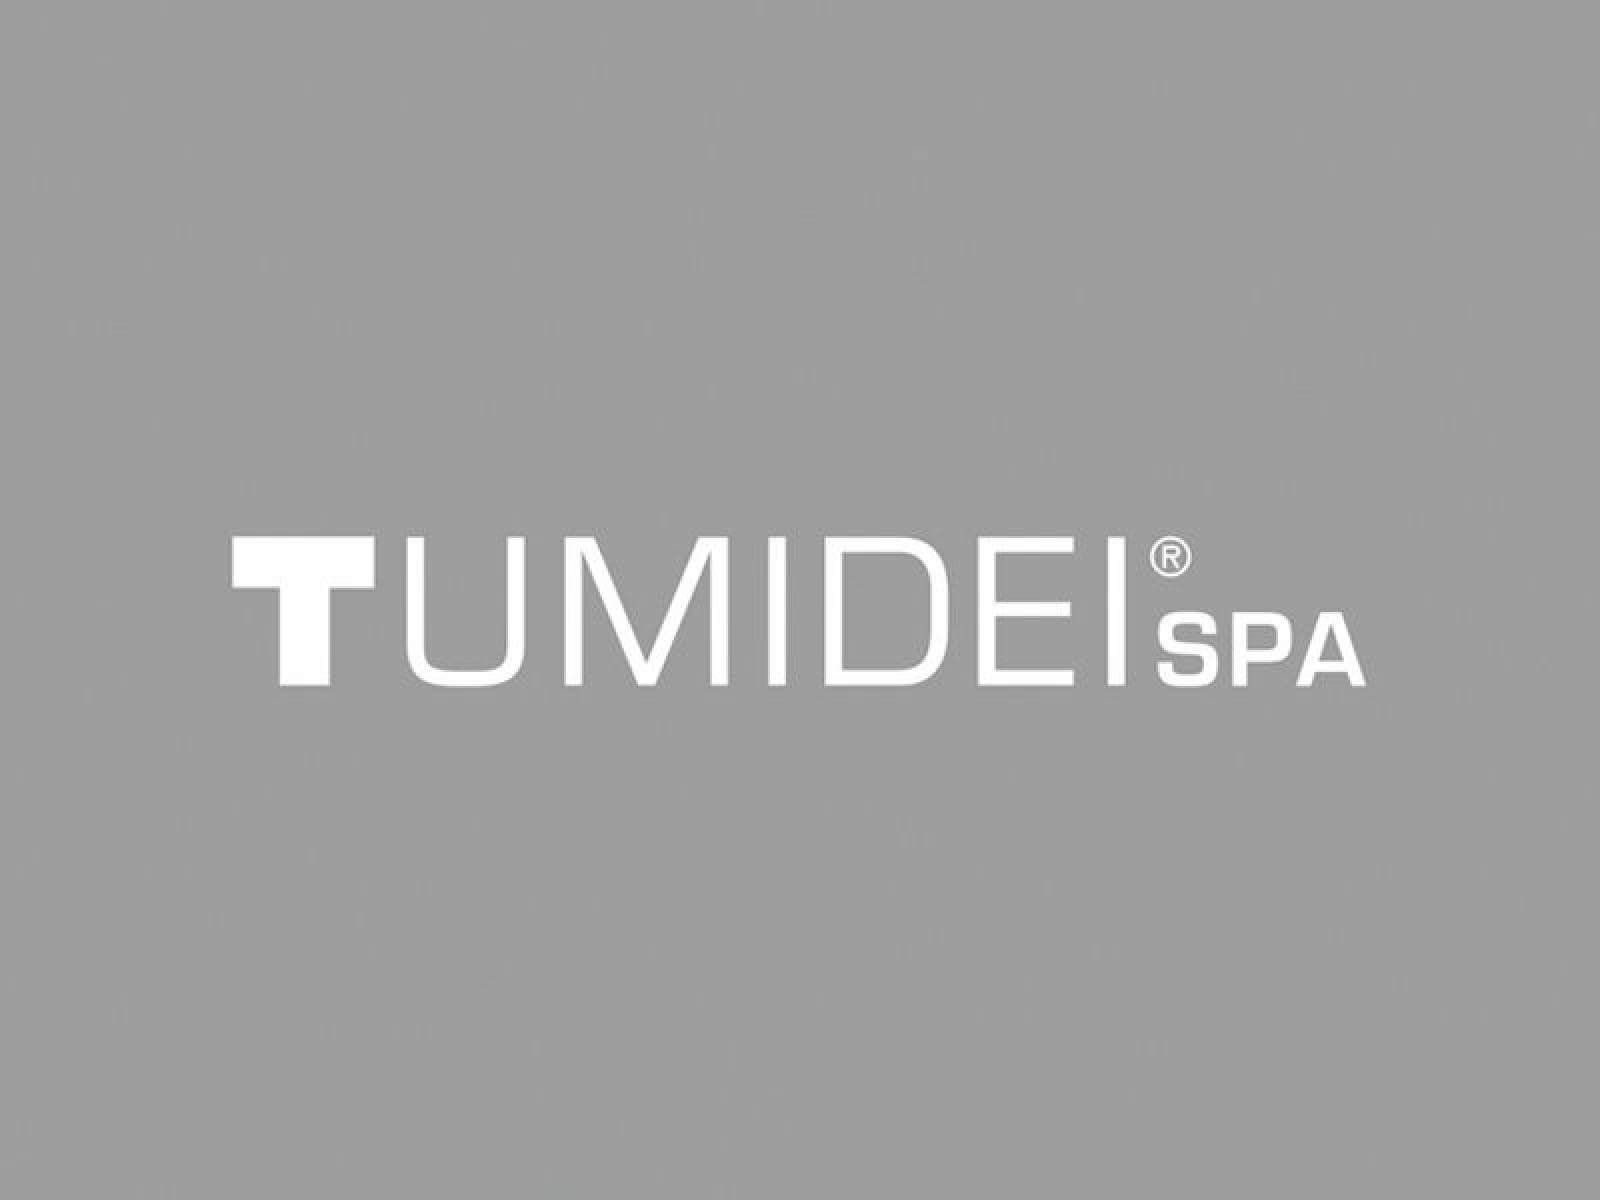 TUMIDEI SPA logo